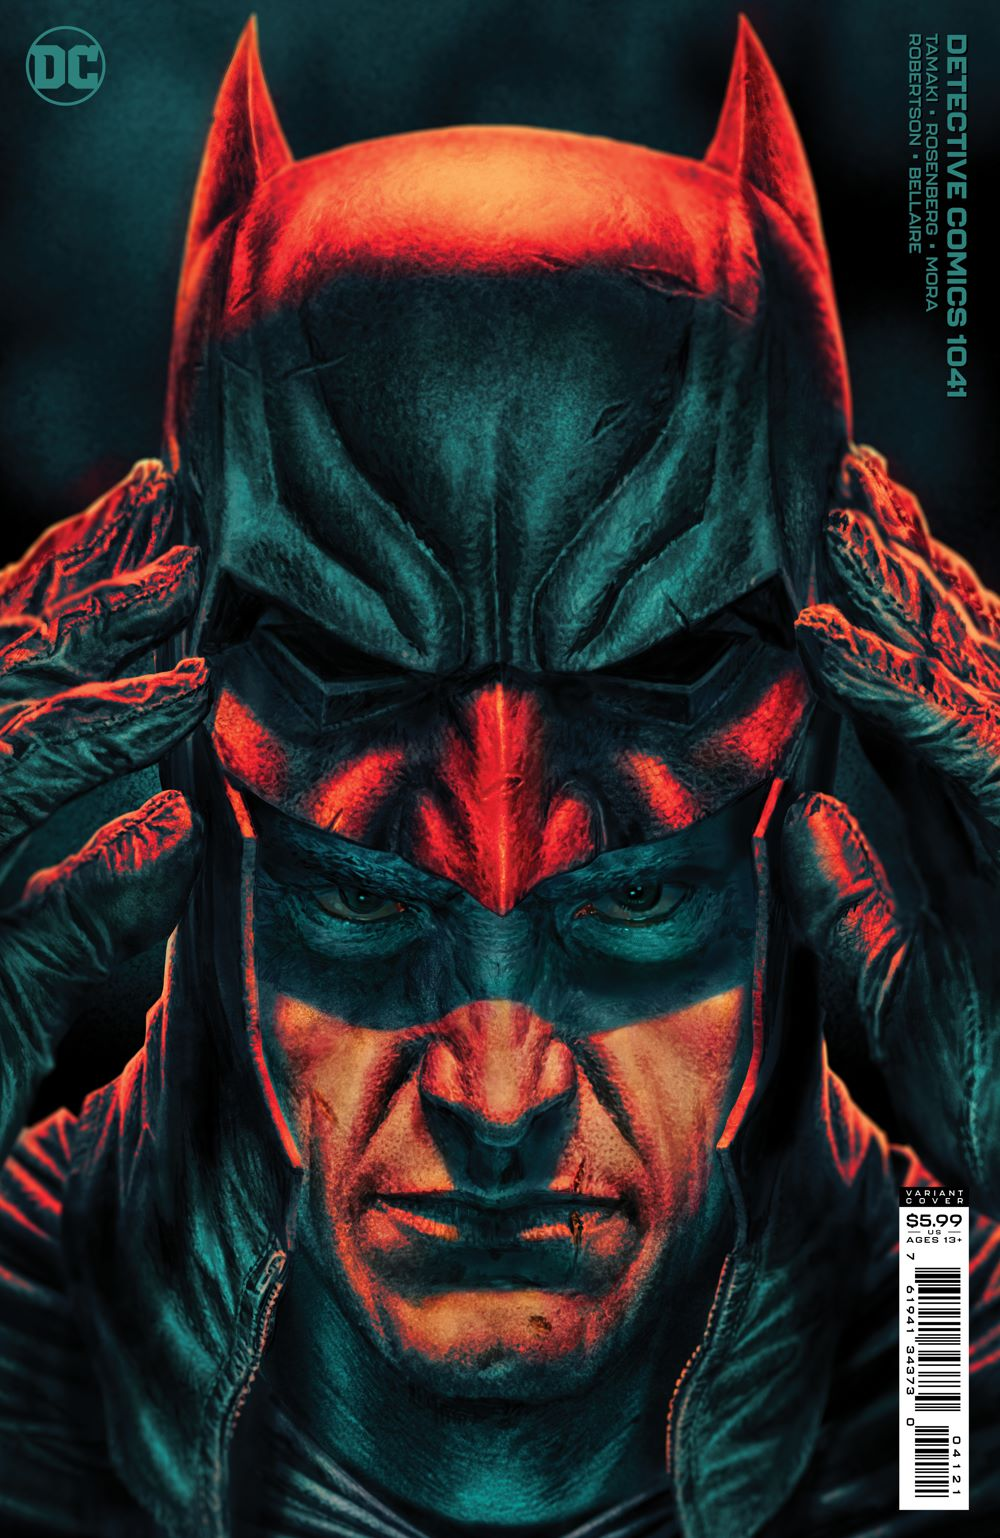 DTC_Cv1041_var DC Comics August 2021 Solicitations